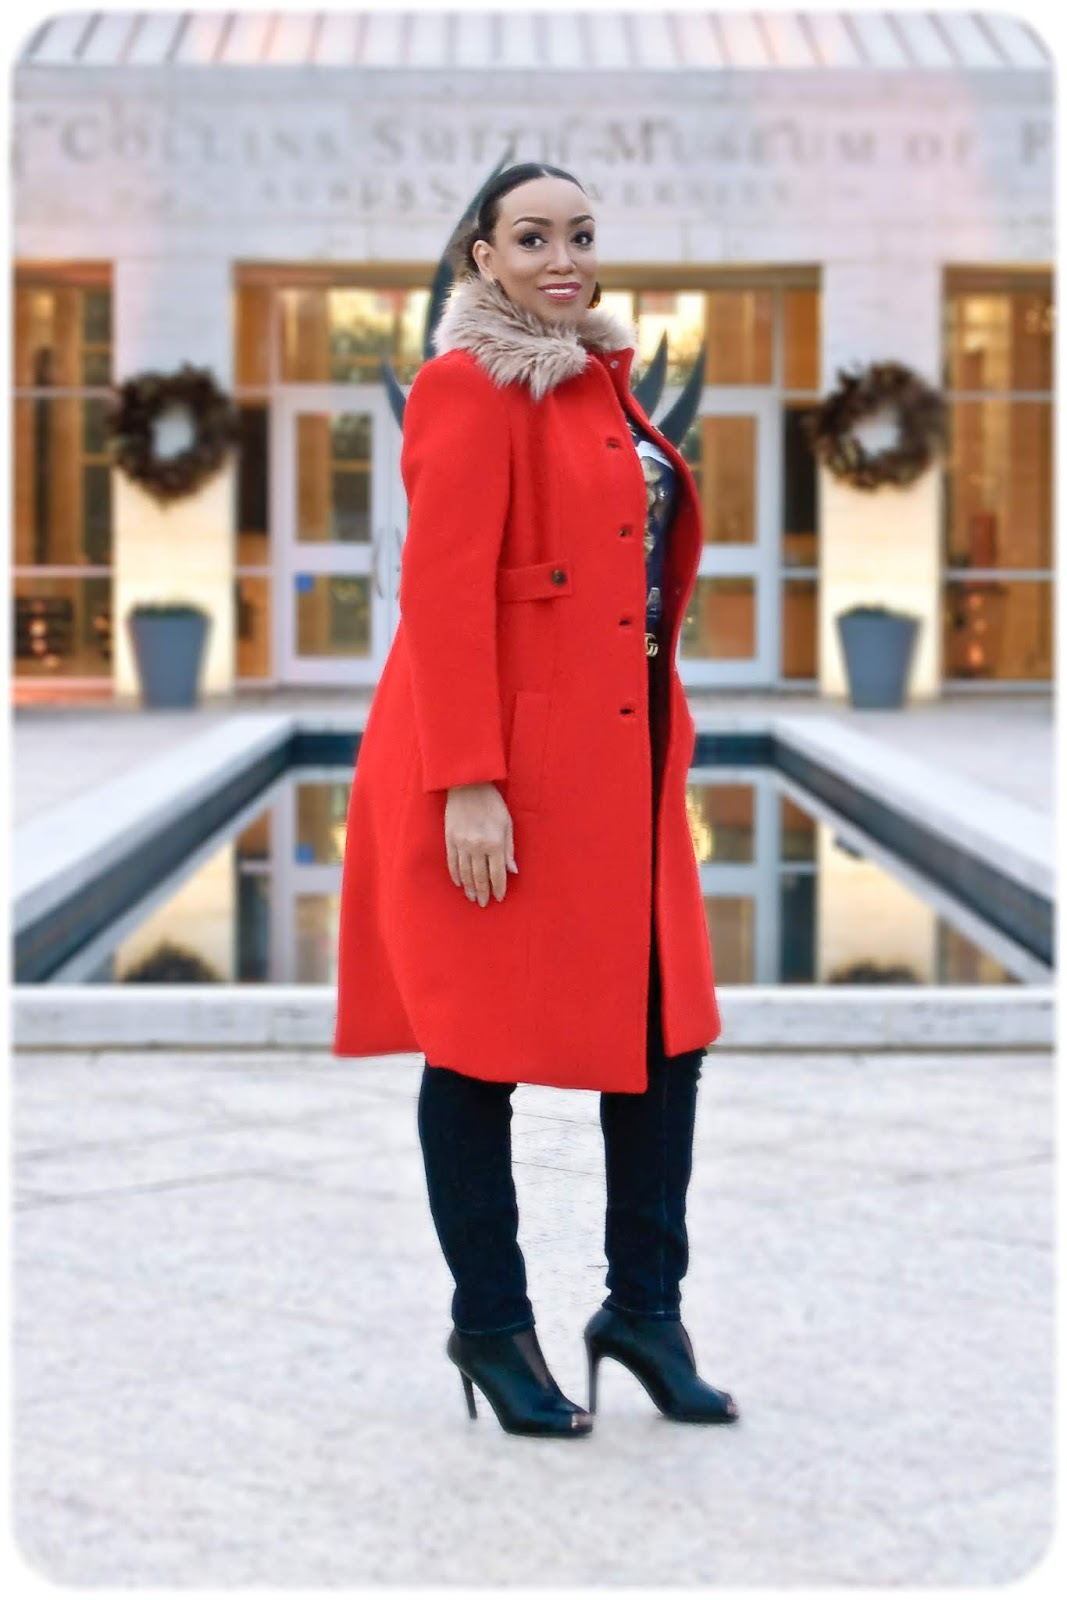 Simplicity 4403 - Fur-Trimmed Red Wool Coat - Erica Bunker DIY Style!